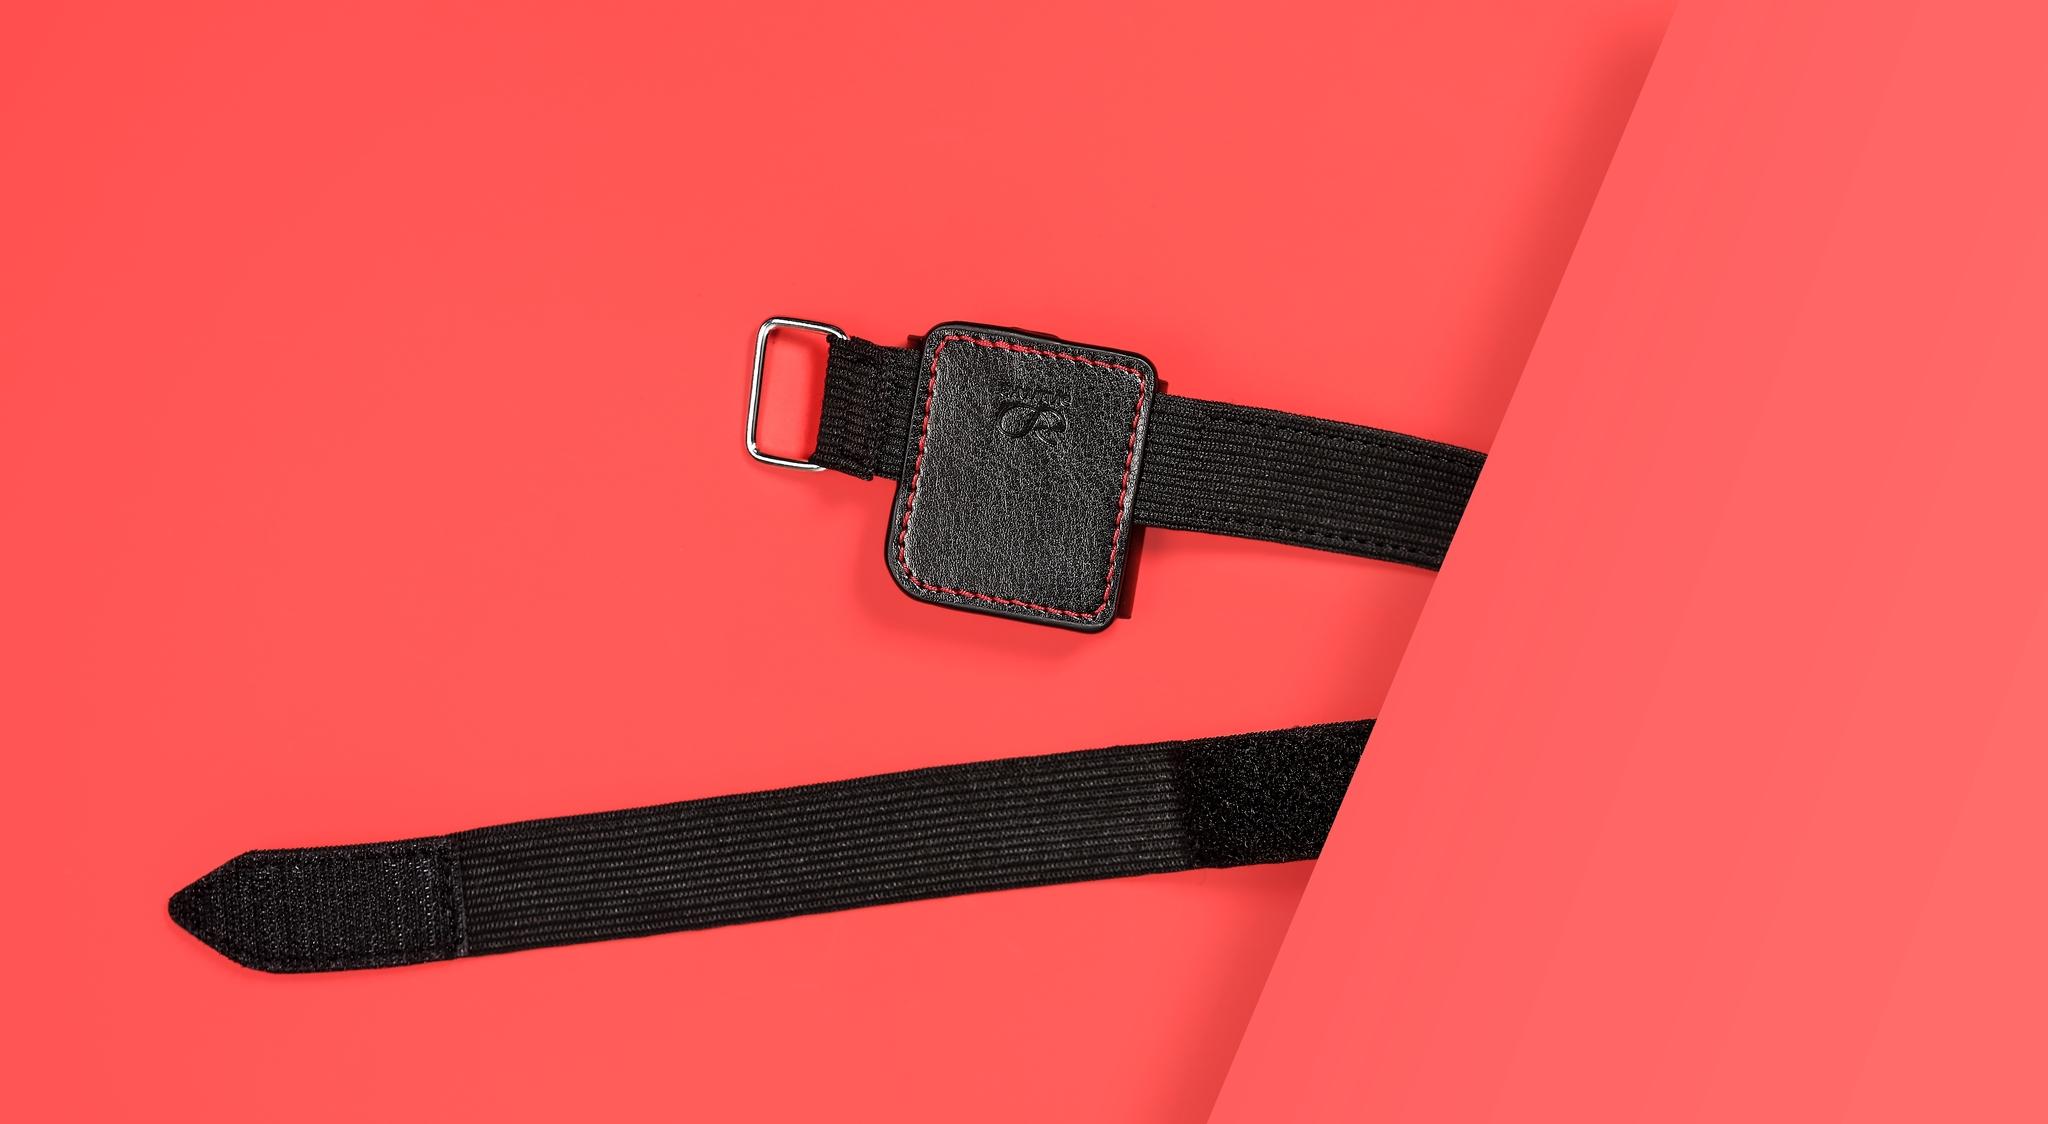 Shanling Armband чехол СИАЙГРУПП